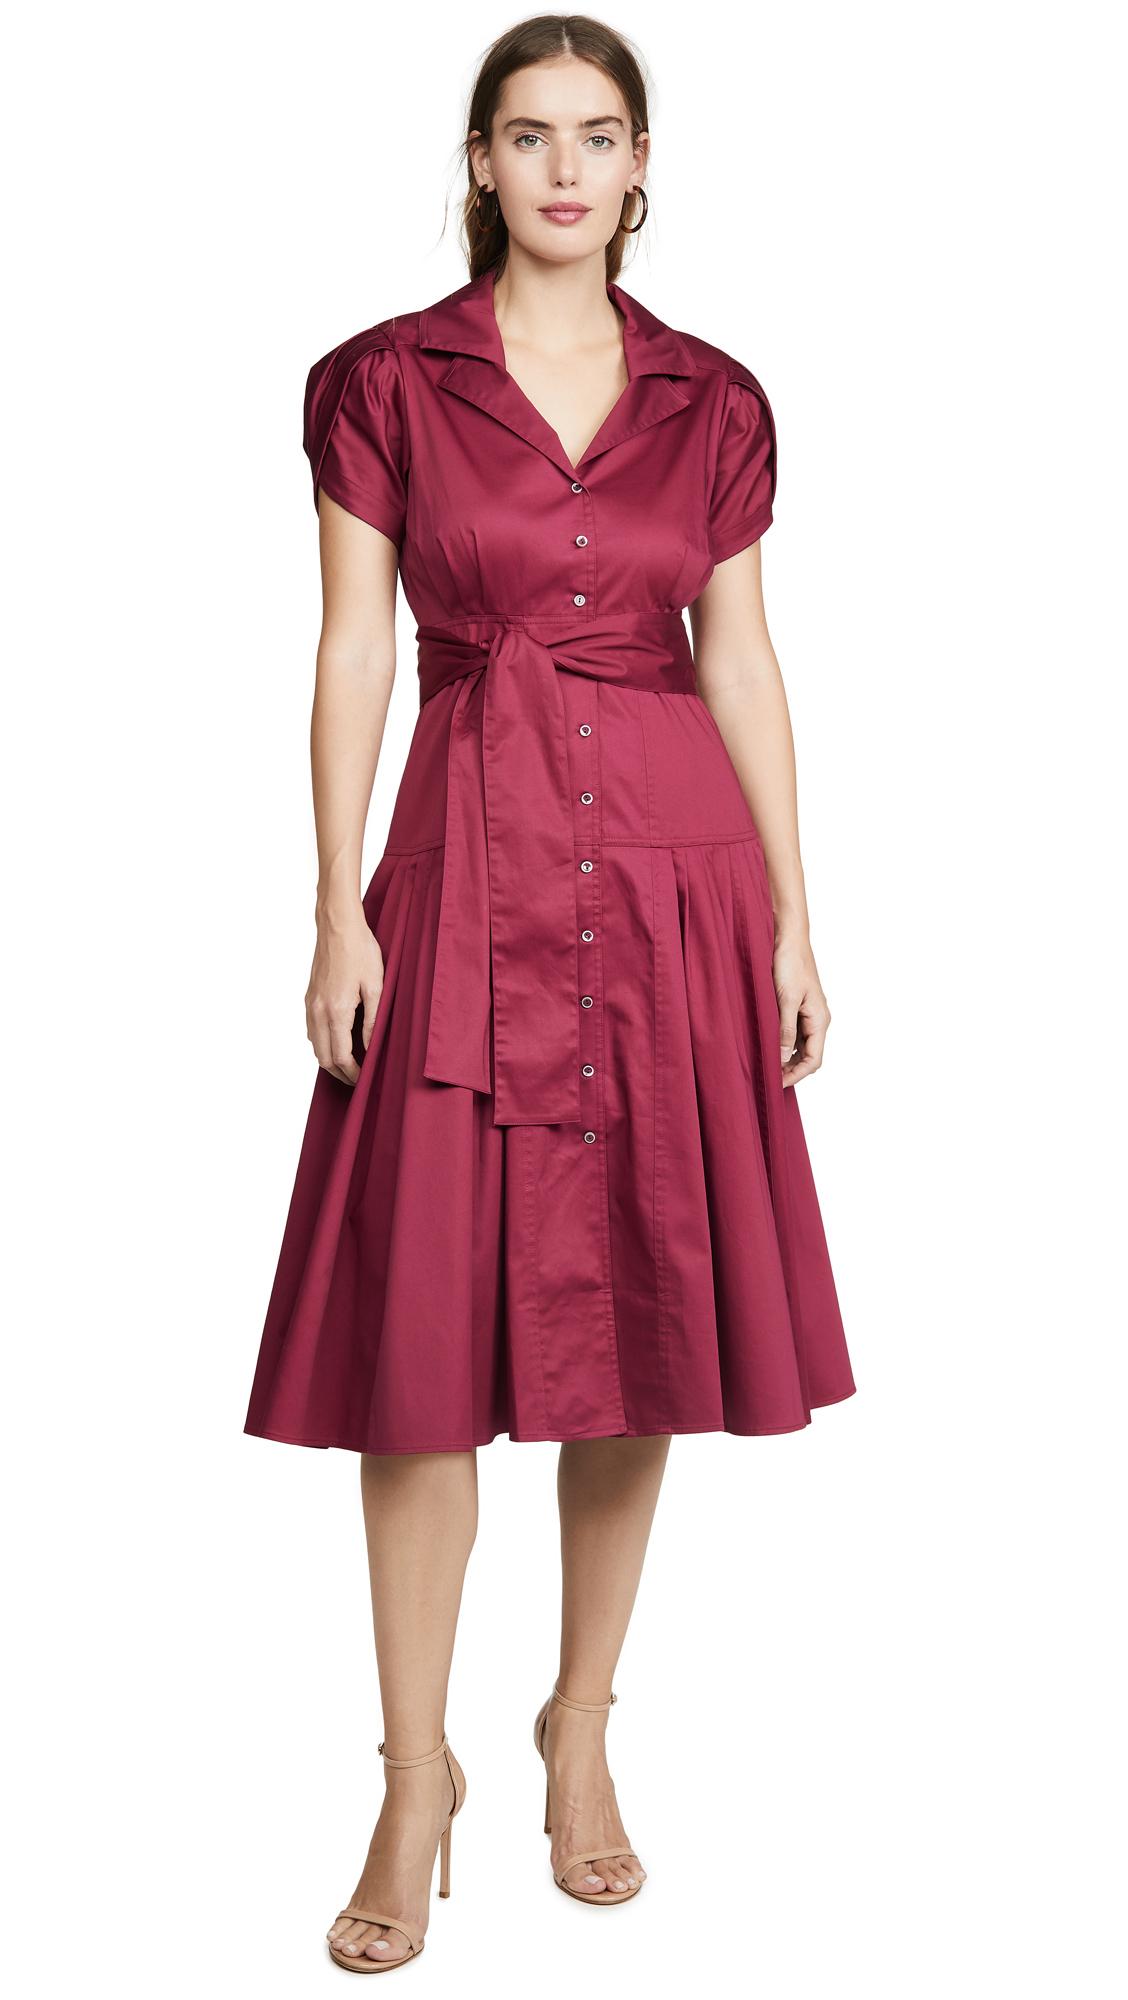 Alexis Rosetta Dress - Raspberry